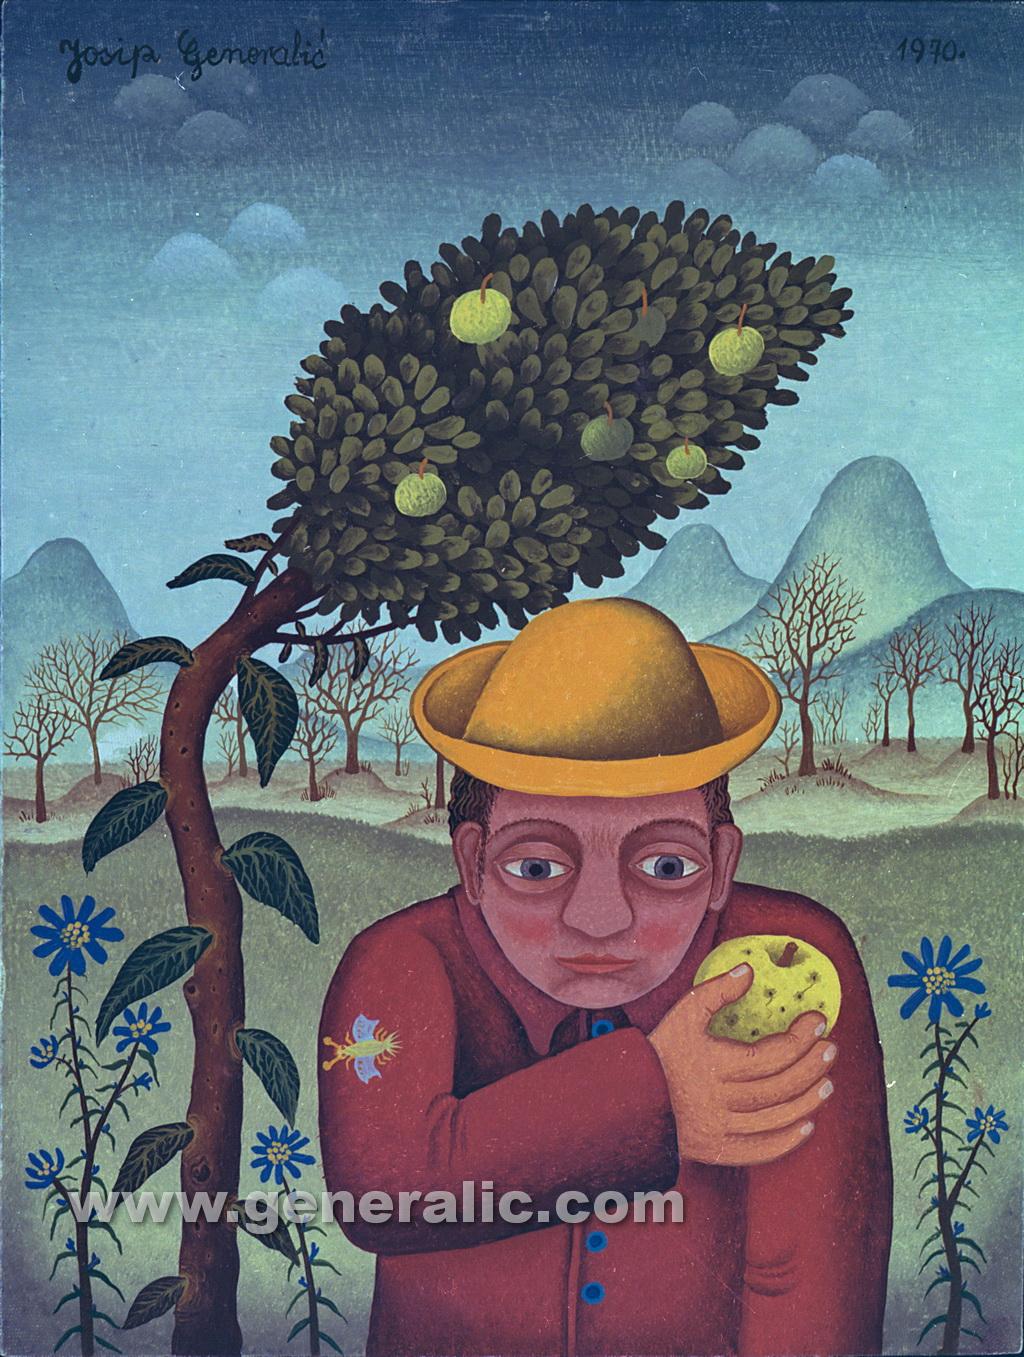 Josip Generalic, 1970, Man with apple, oil on canvas